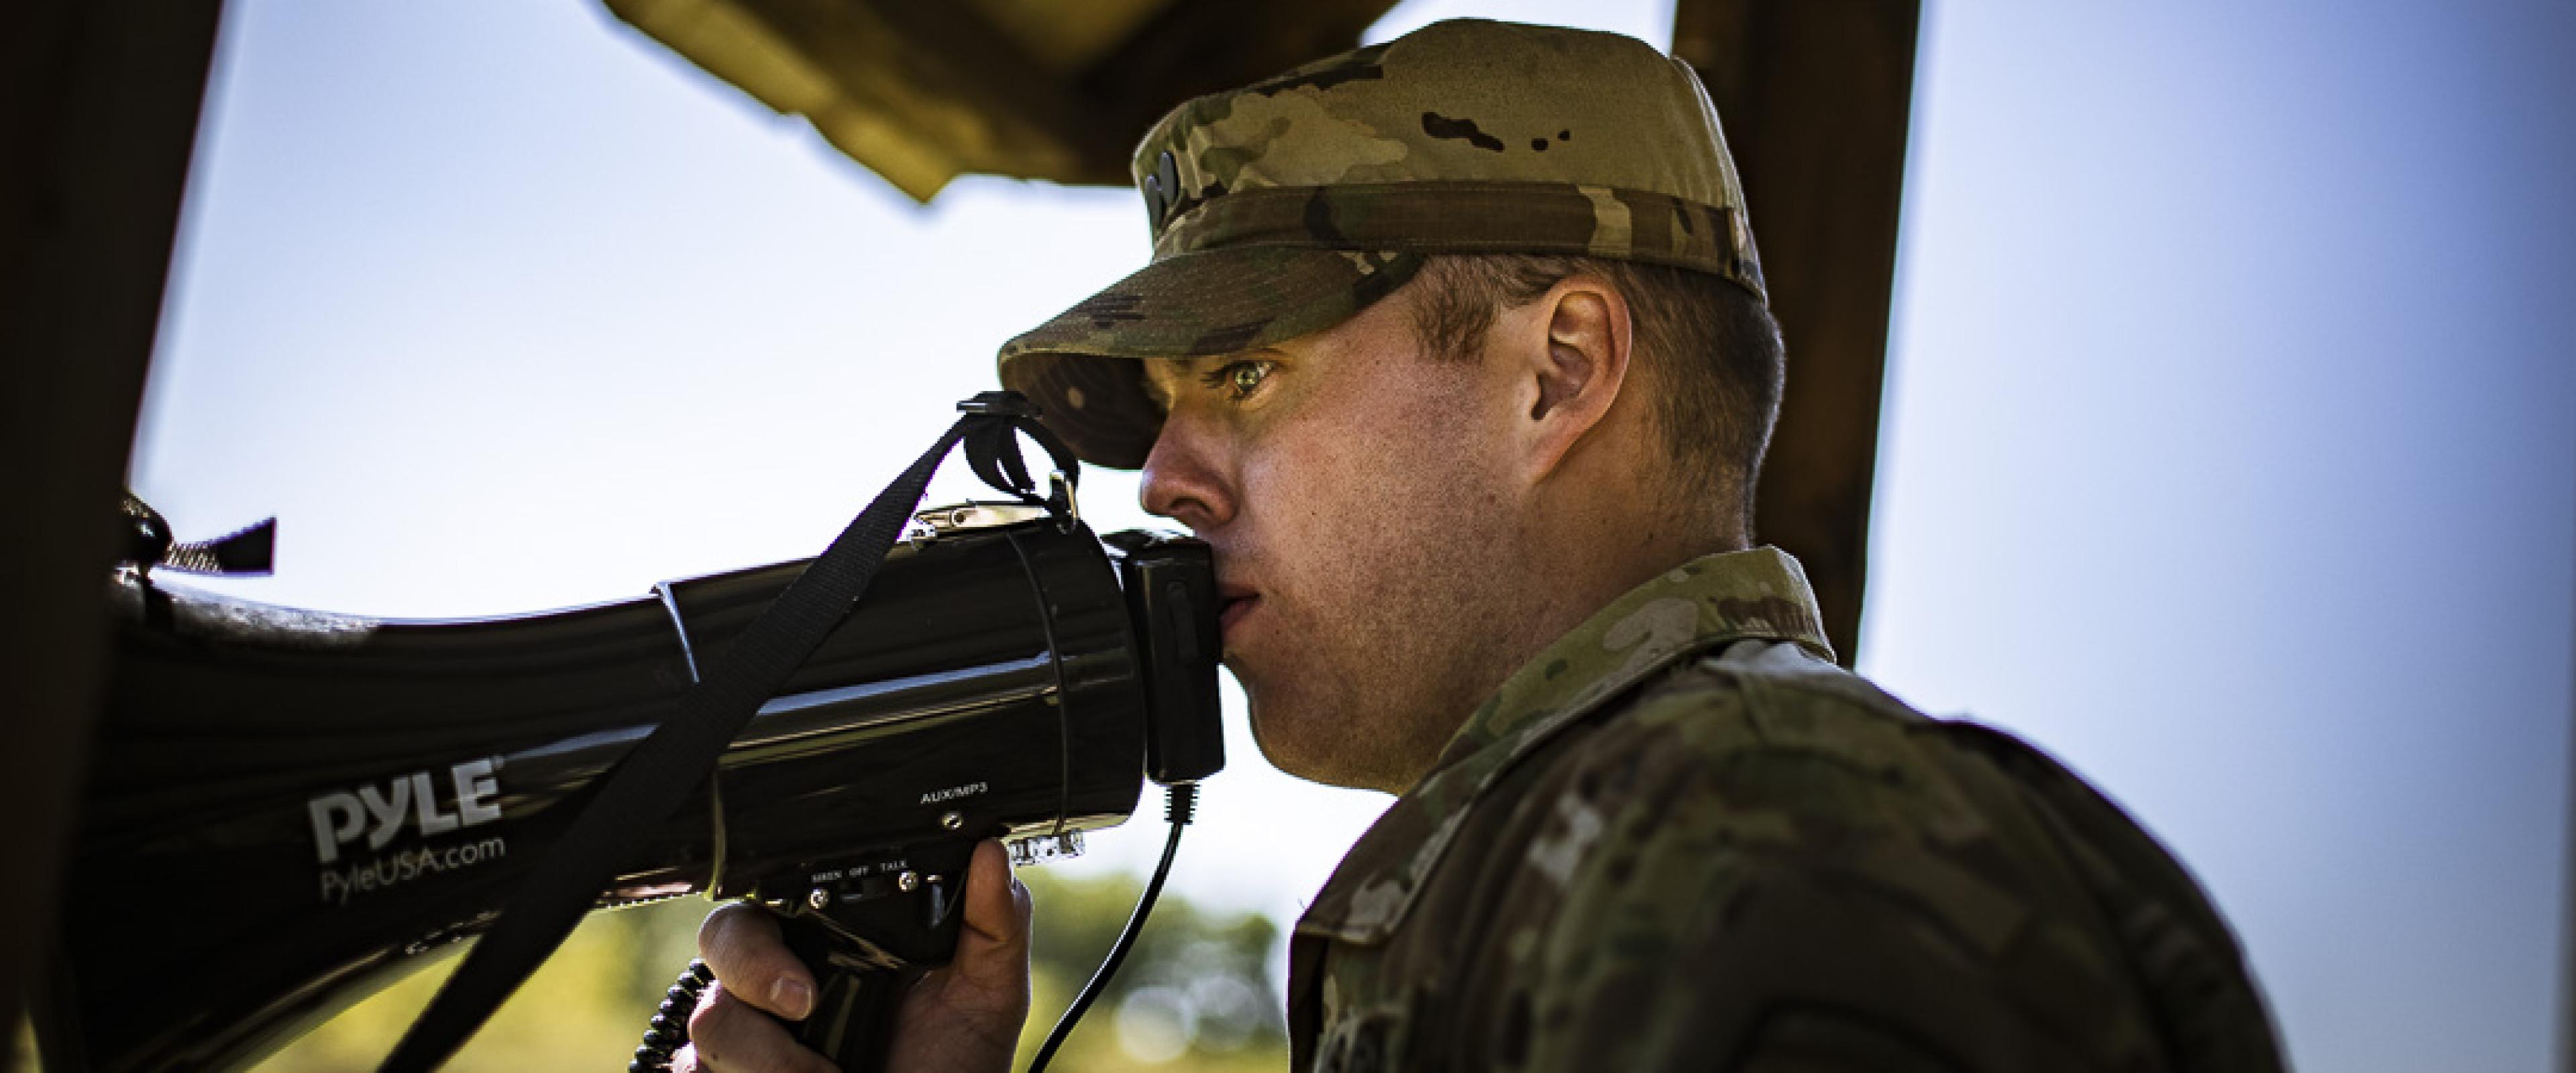 Cadet speaking through a megaphone